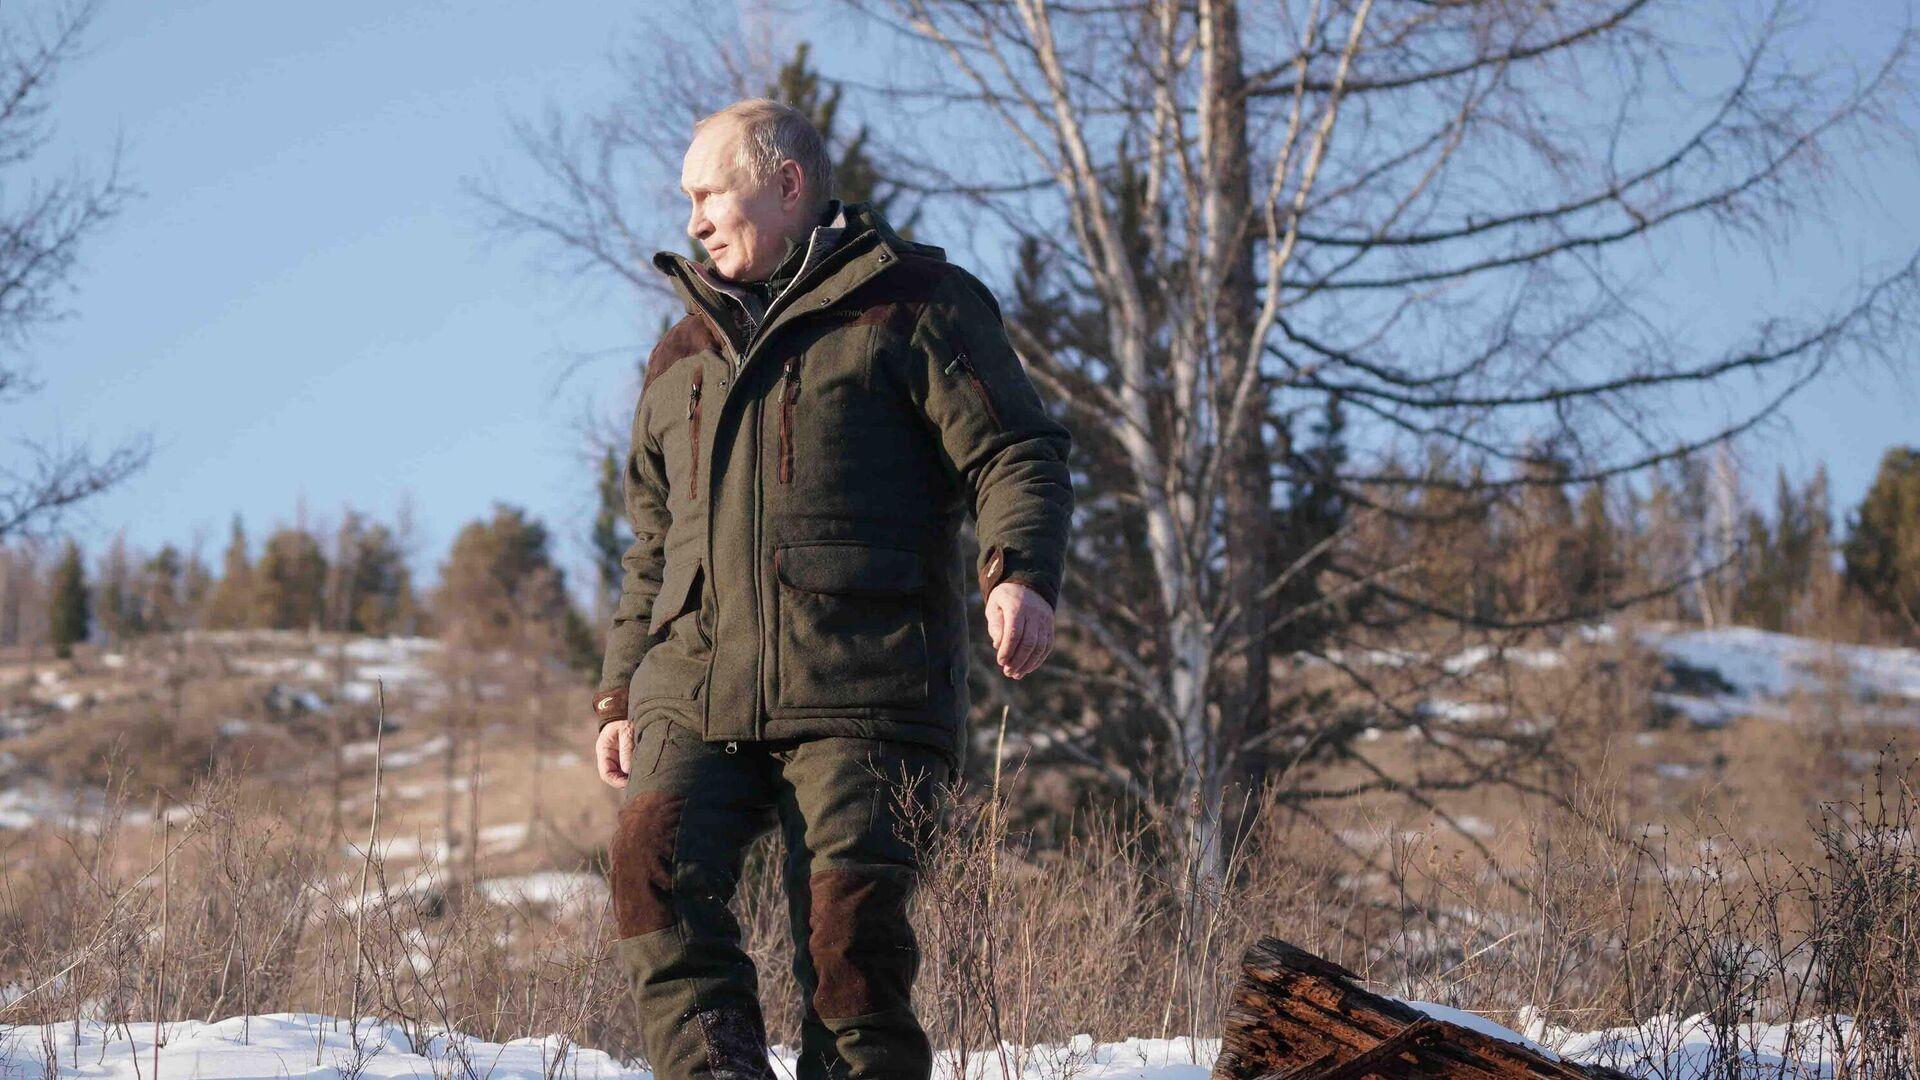 Президент РФ Владимир Путин во время прогулки в тайге - РИА Новости, 1920, 24.03.2021